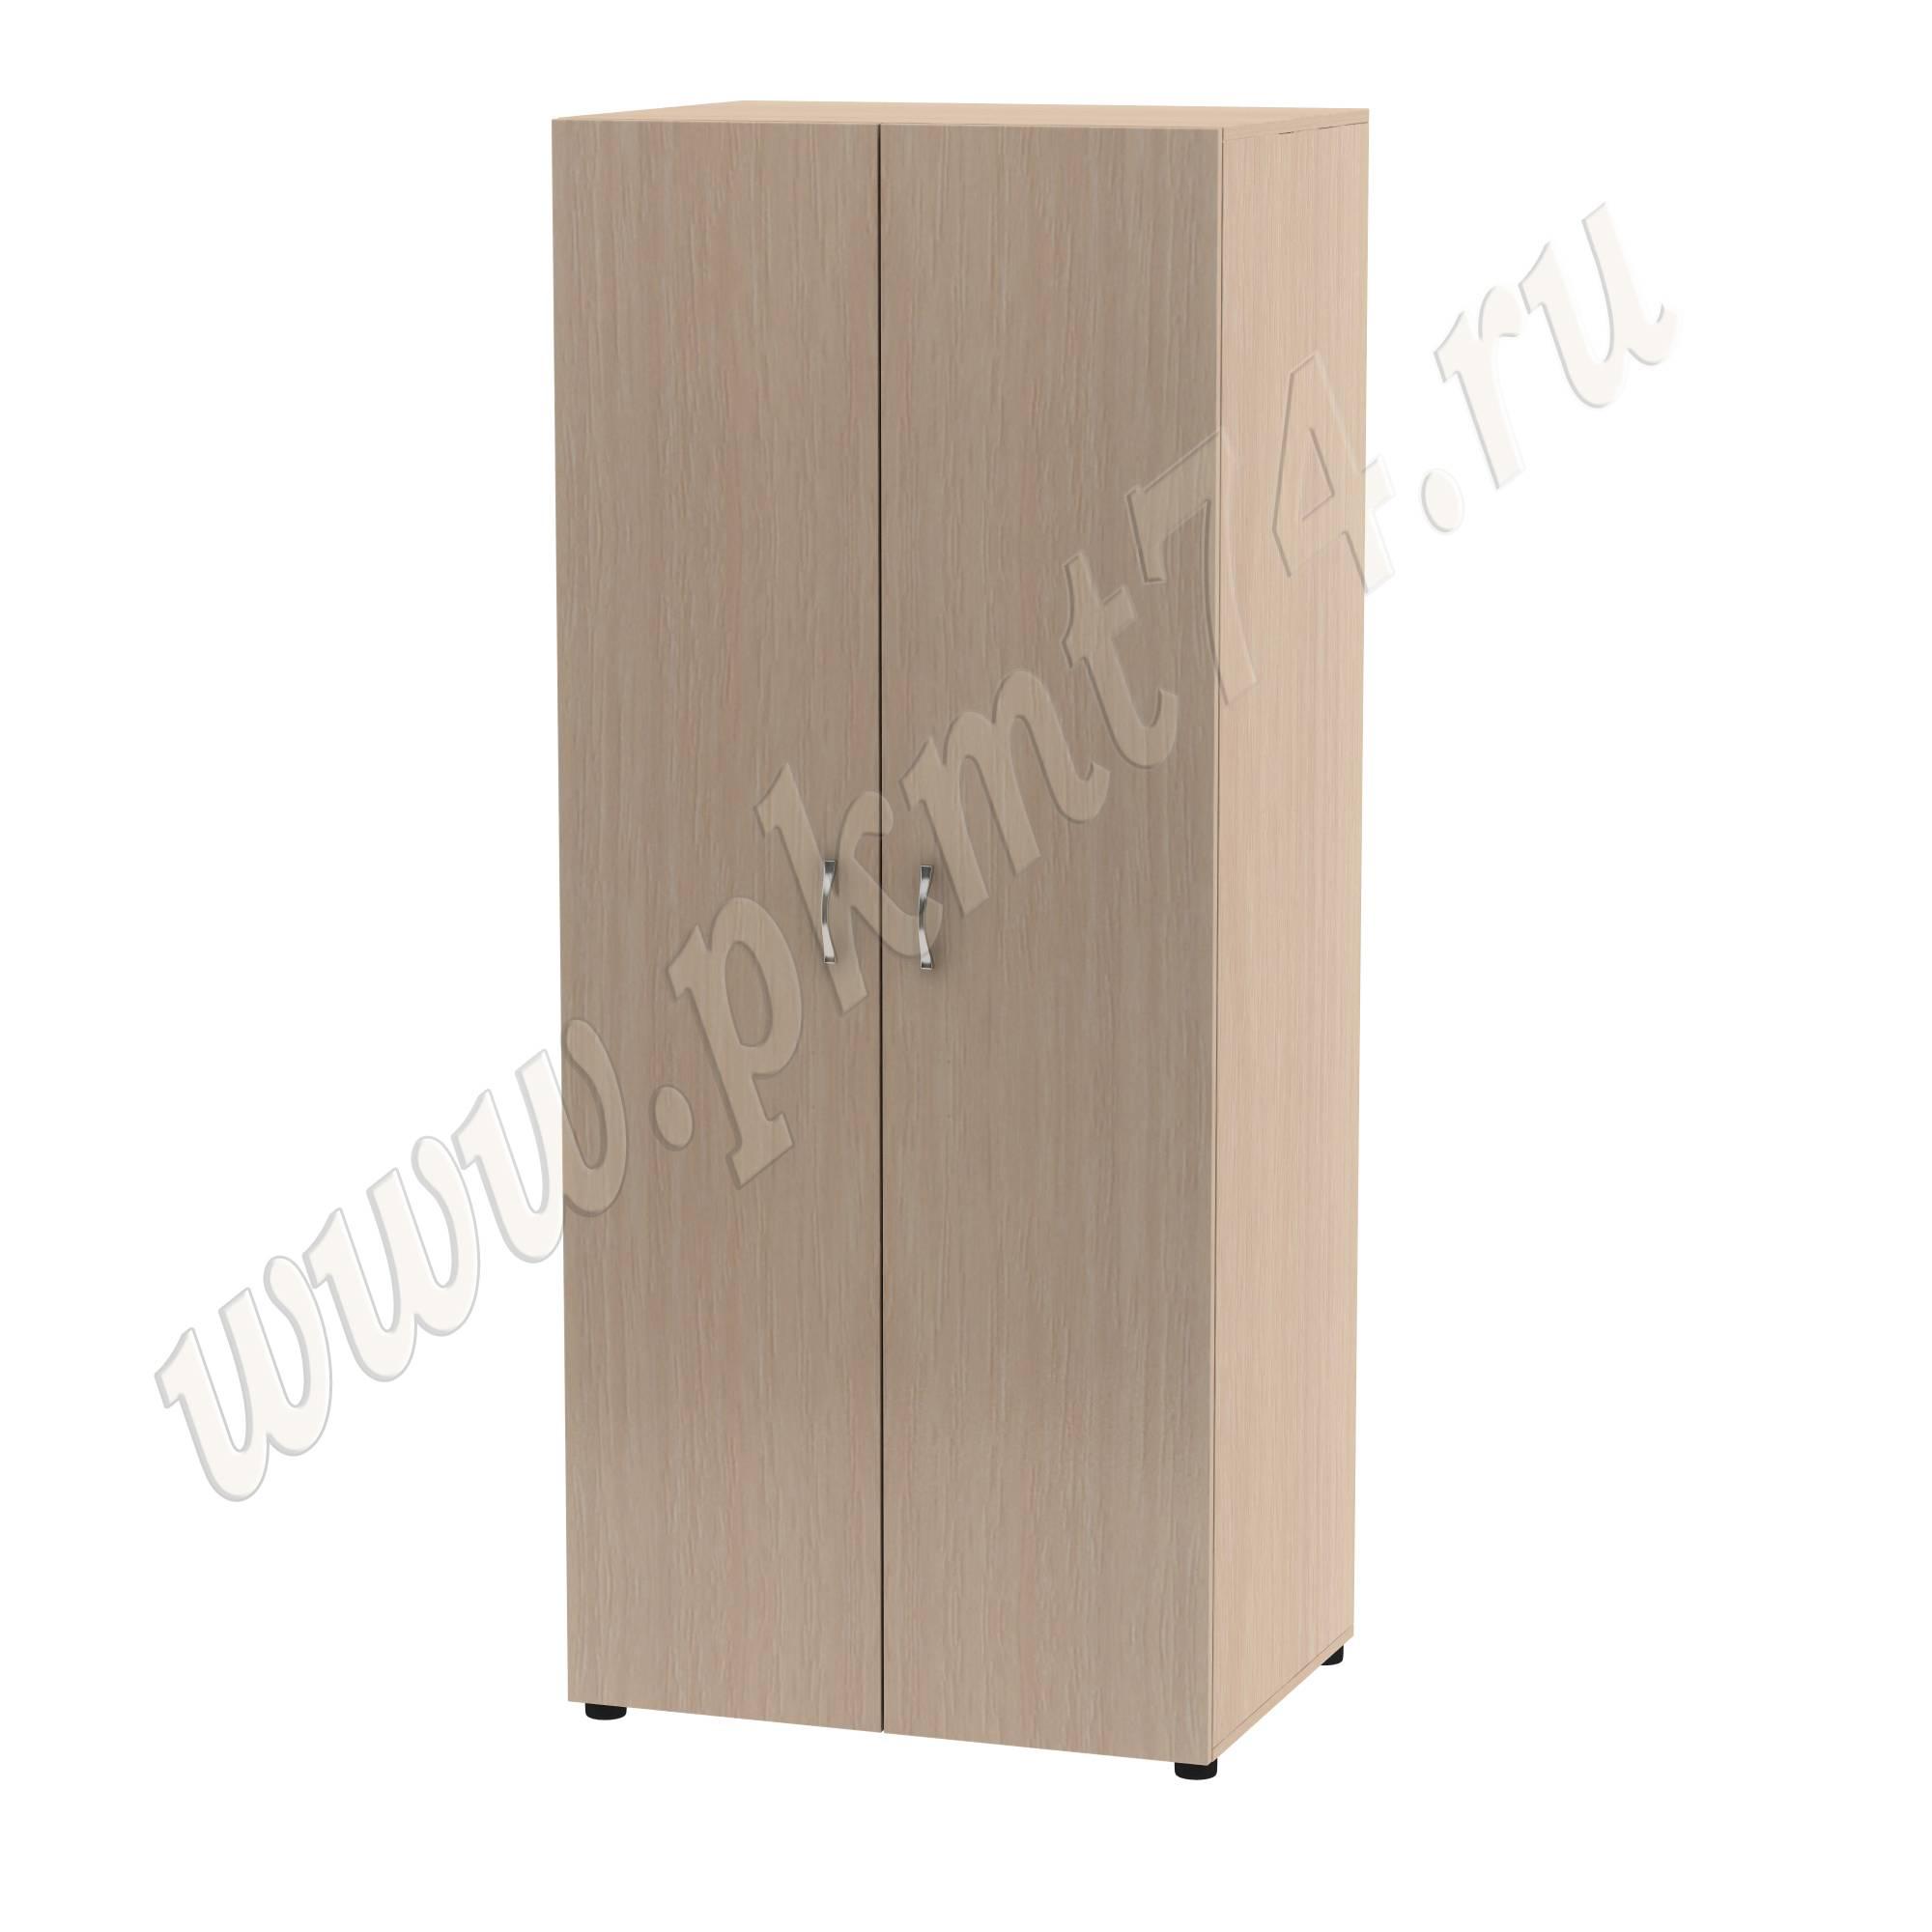 Шкаф платяной со штангой MT 14-16